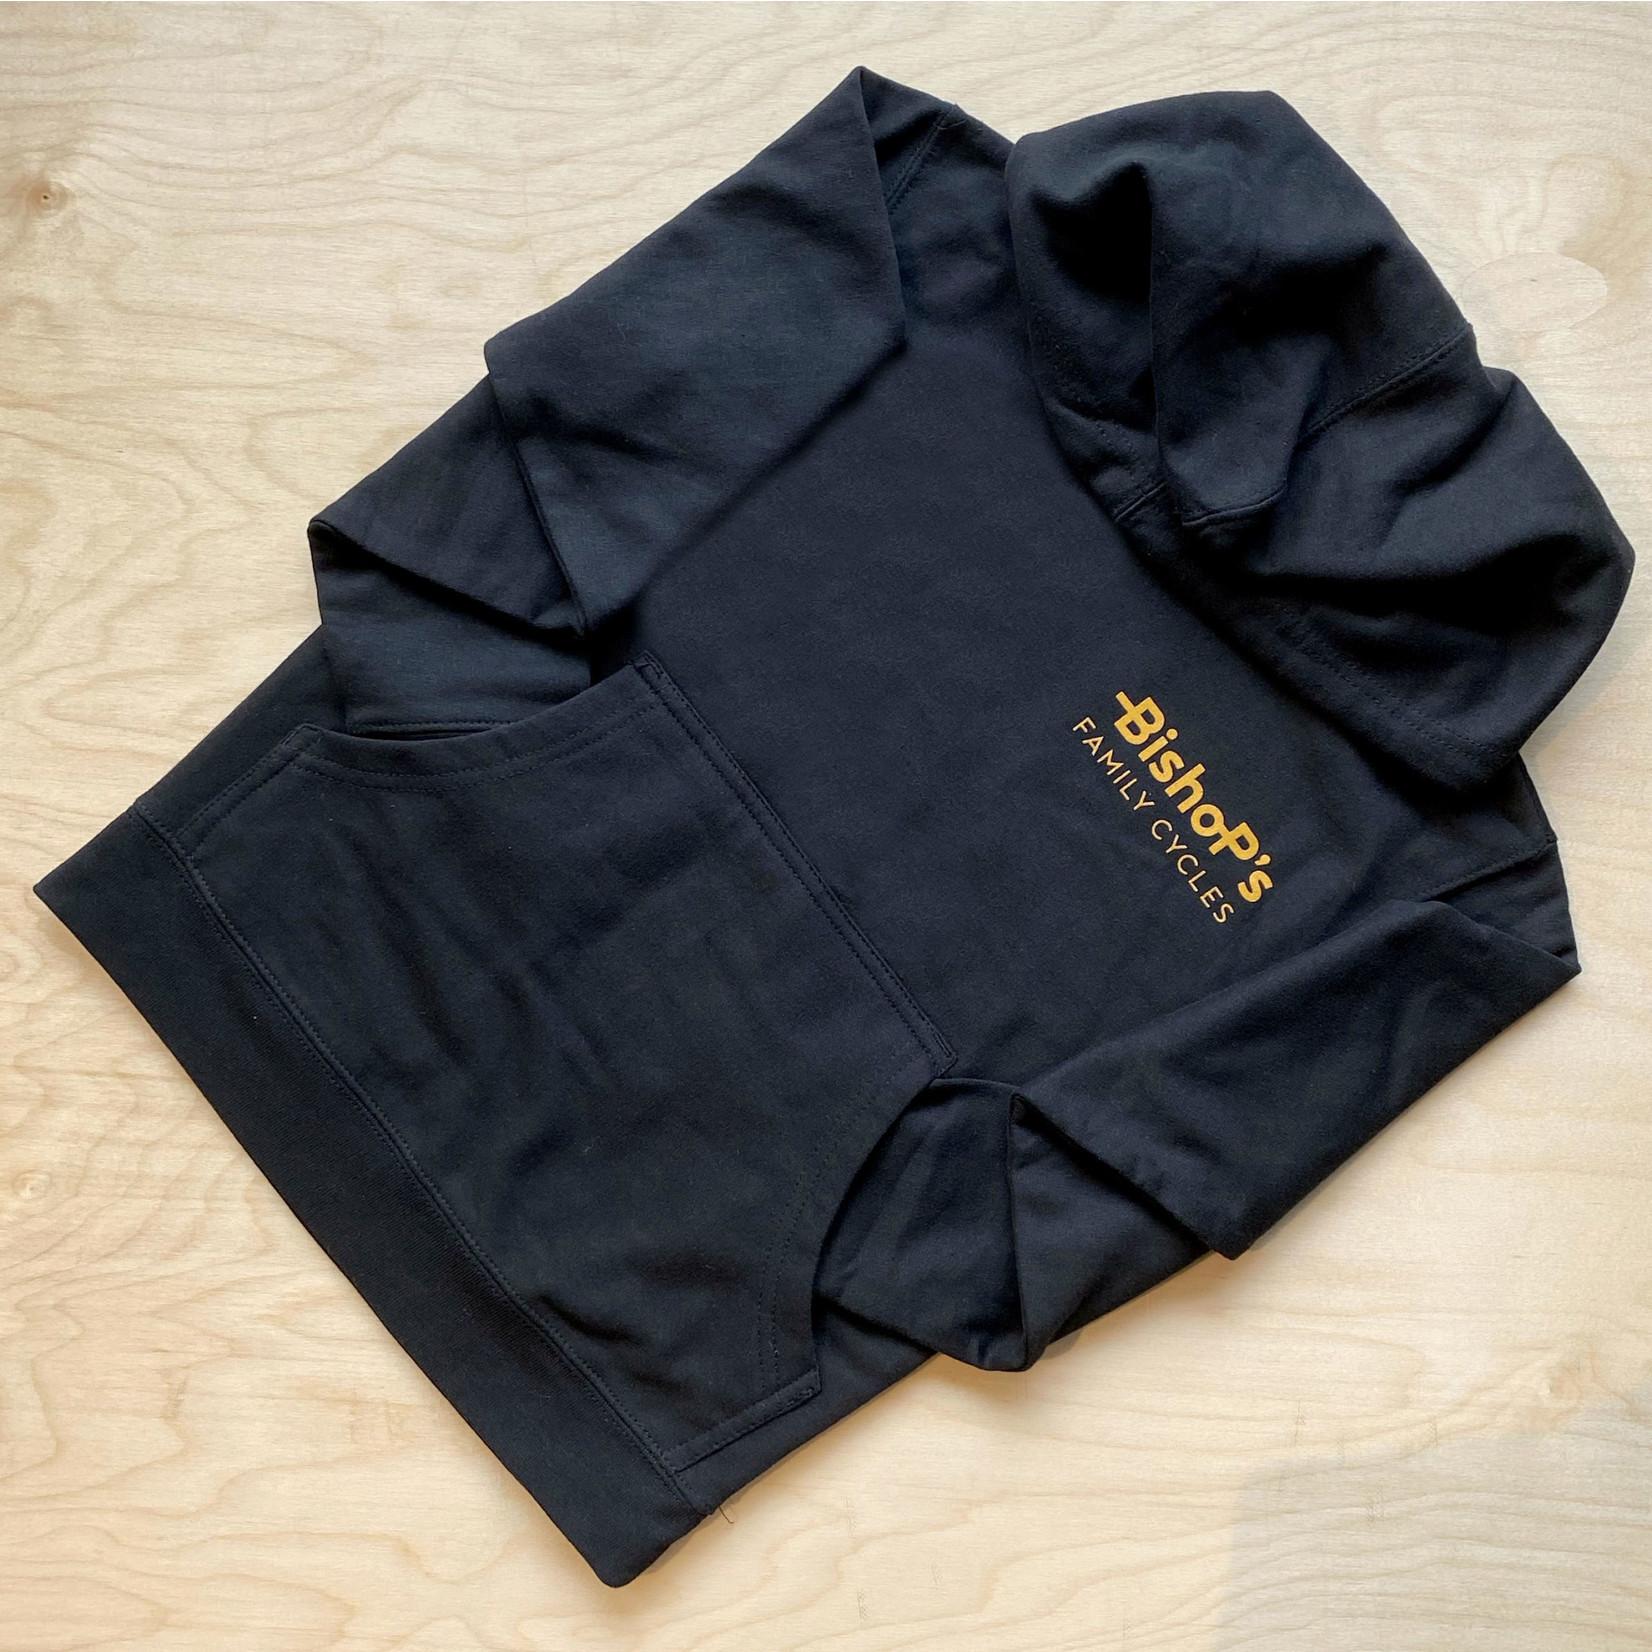 Bishop's Youth Pull-Over Sweatshirt